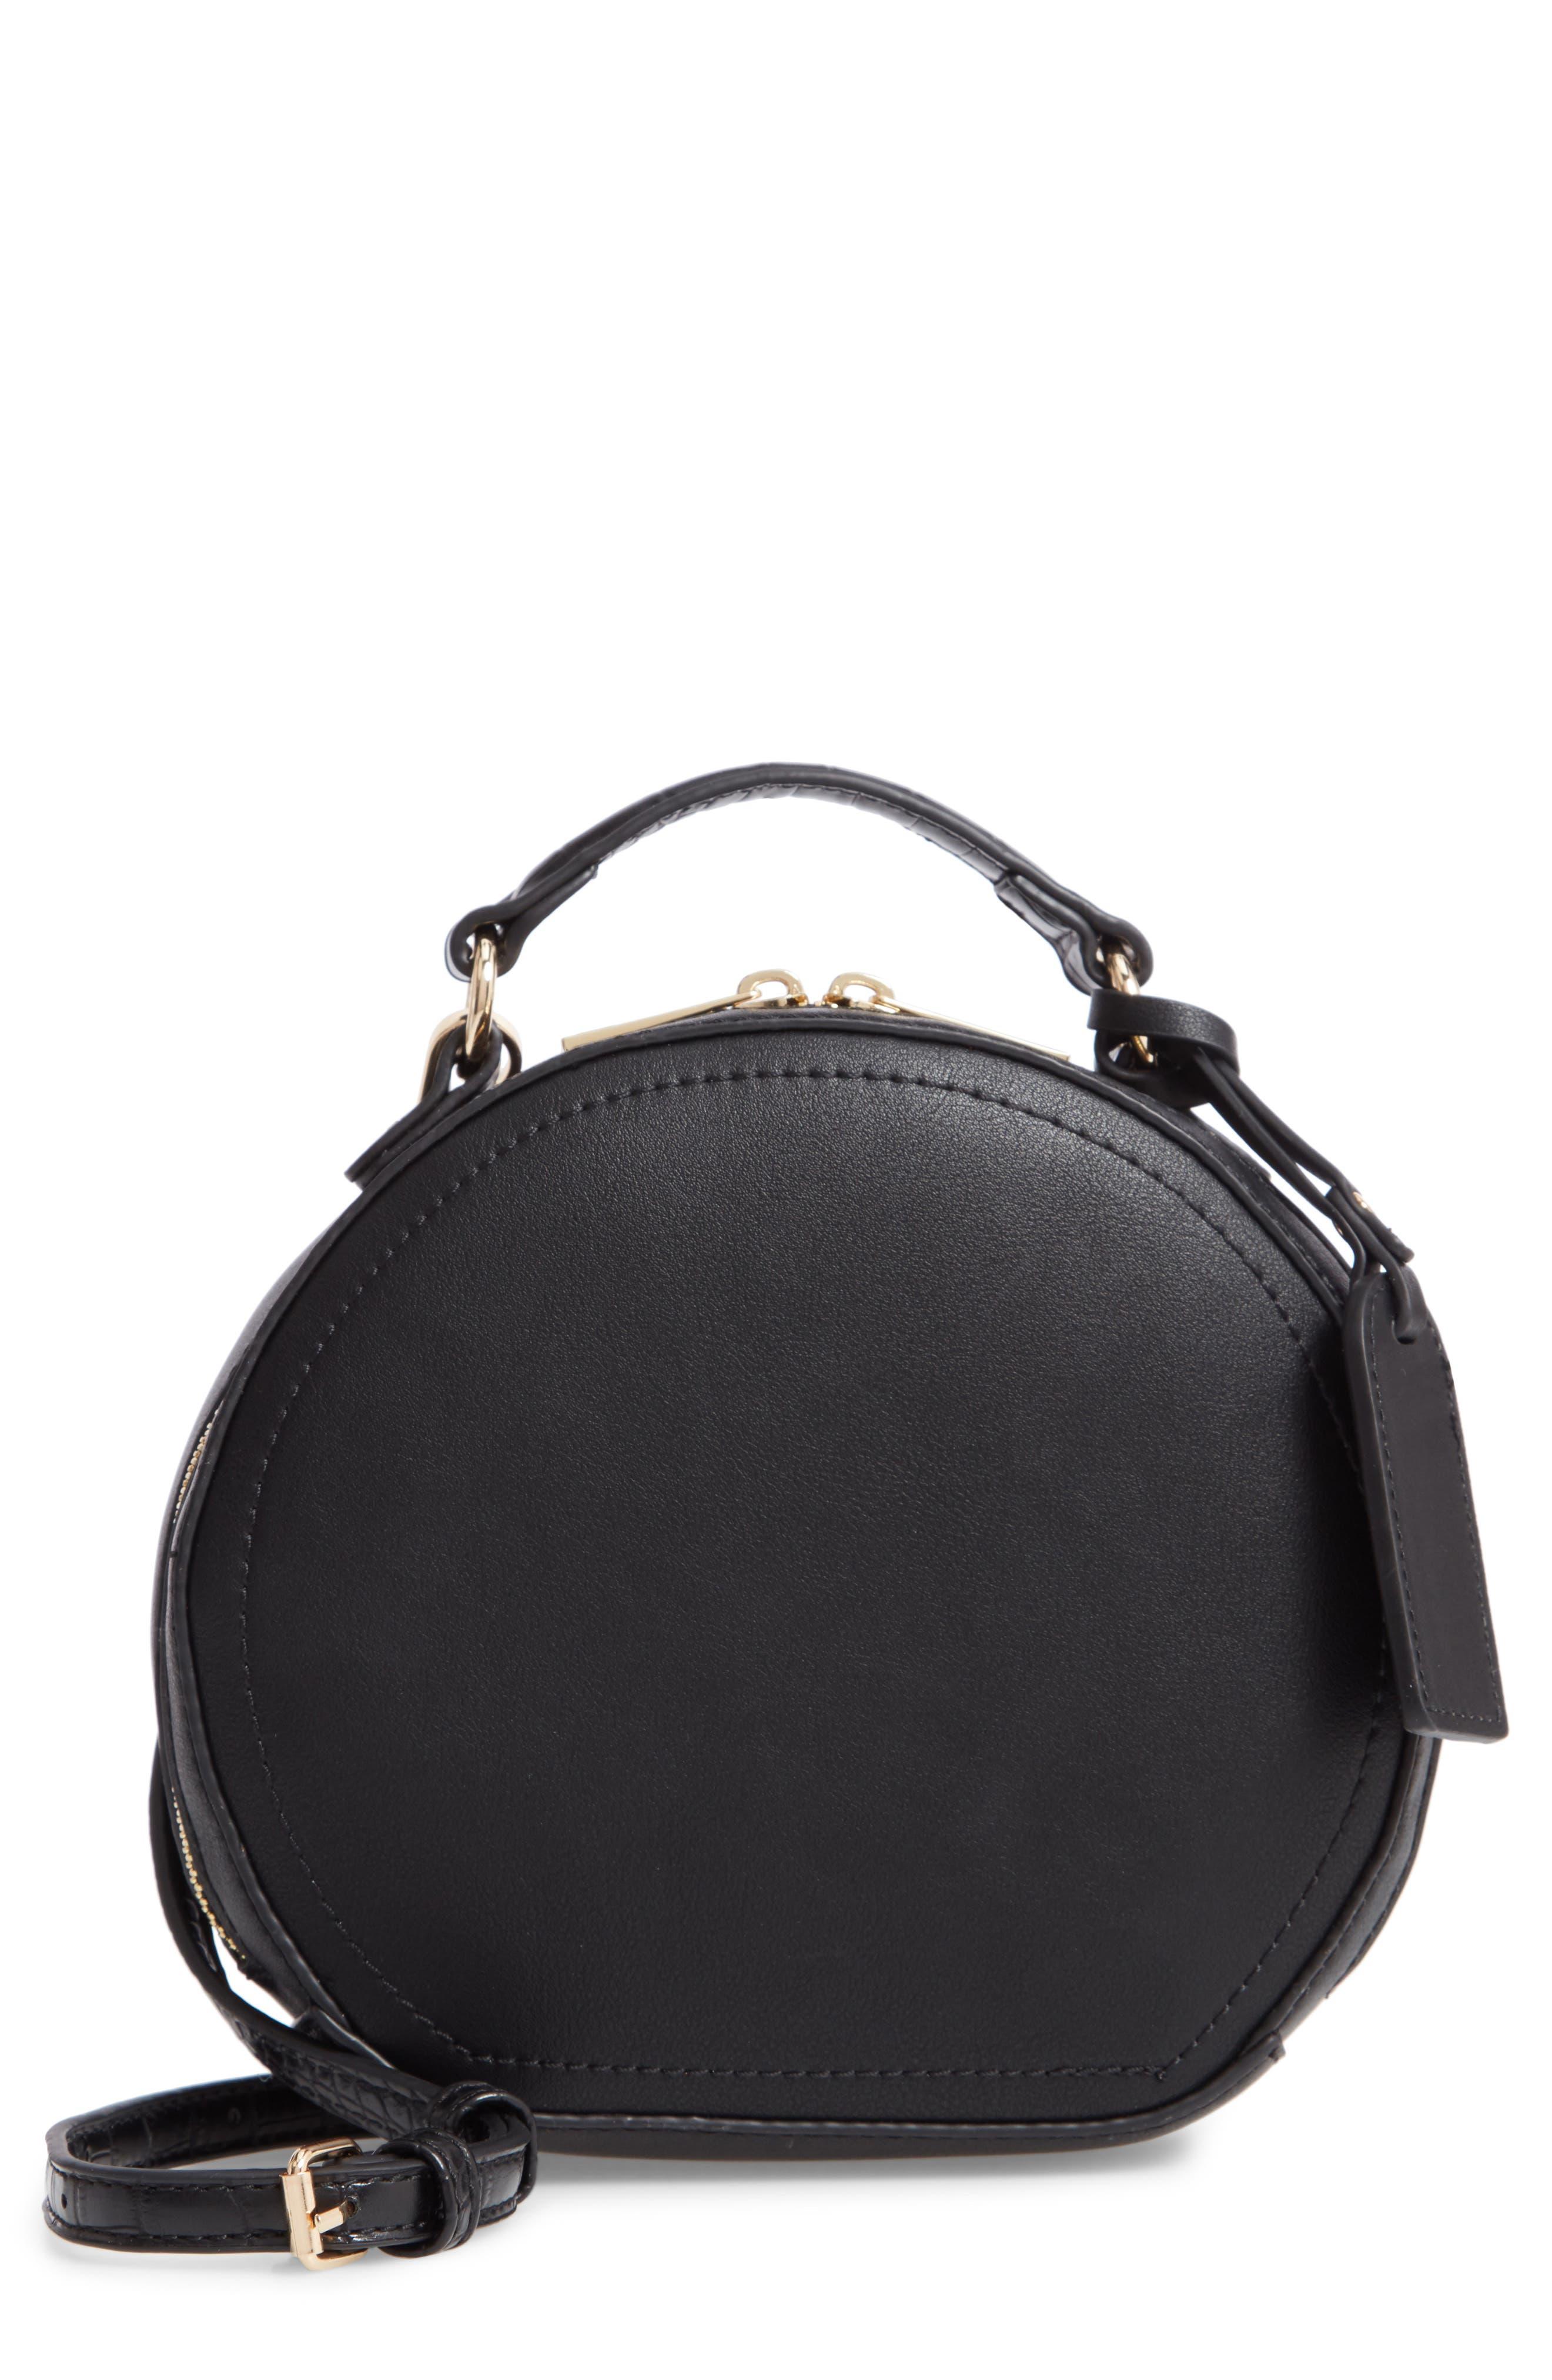 SOLE SOCIETY Jayma Circle Crossbody Bag, Main, color, 001